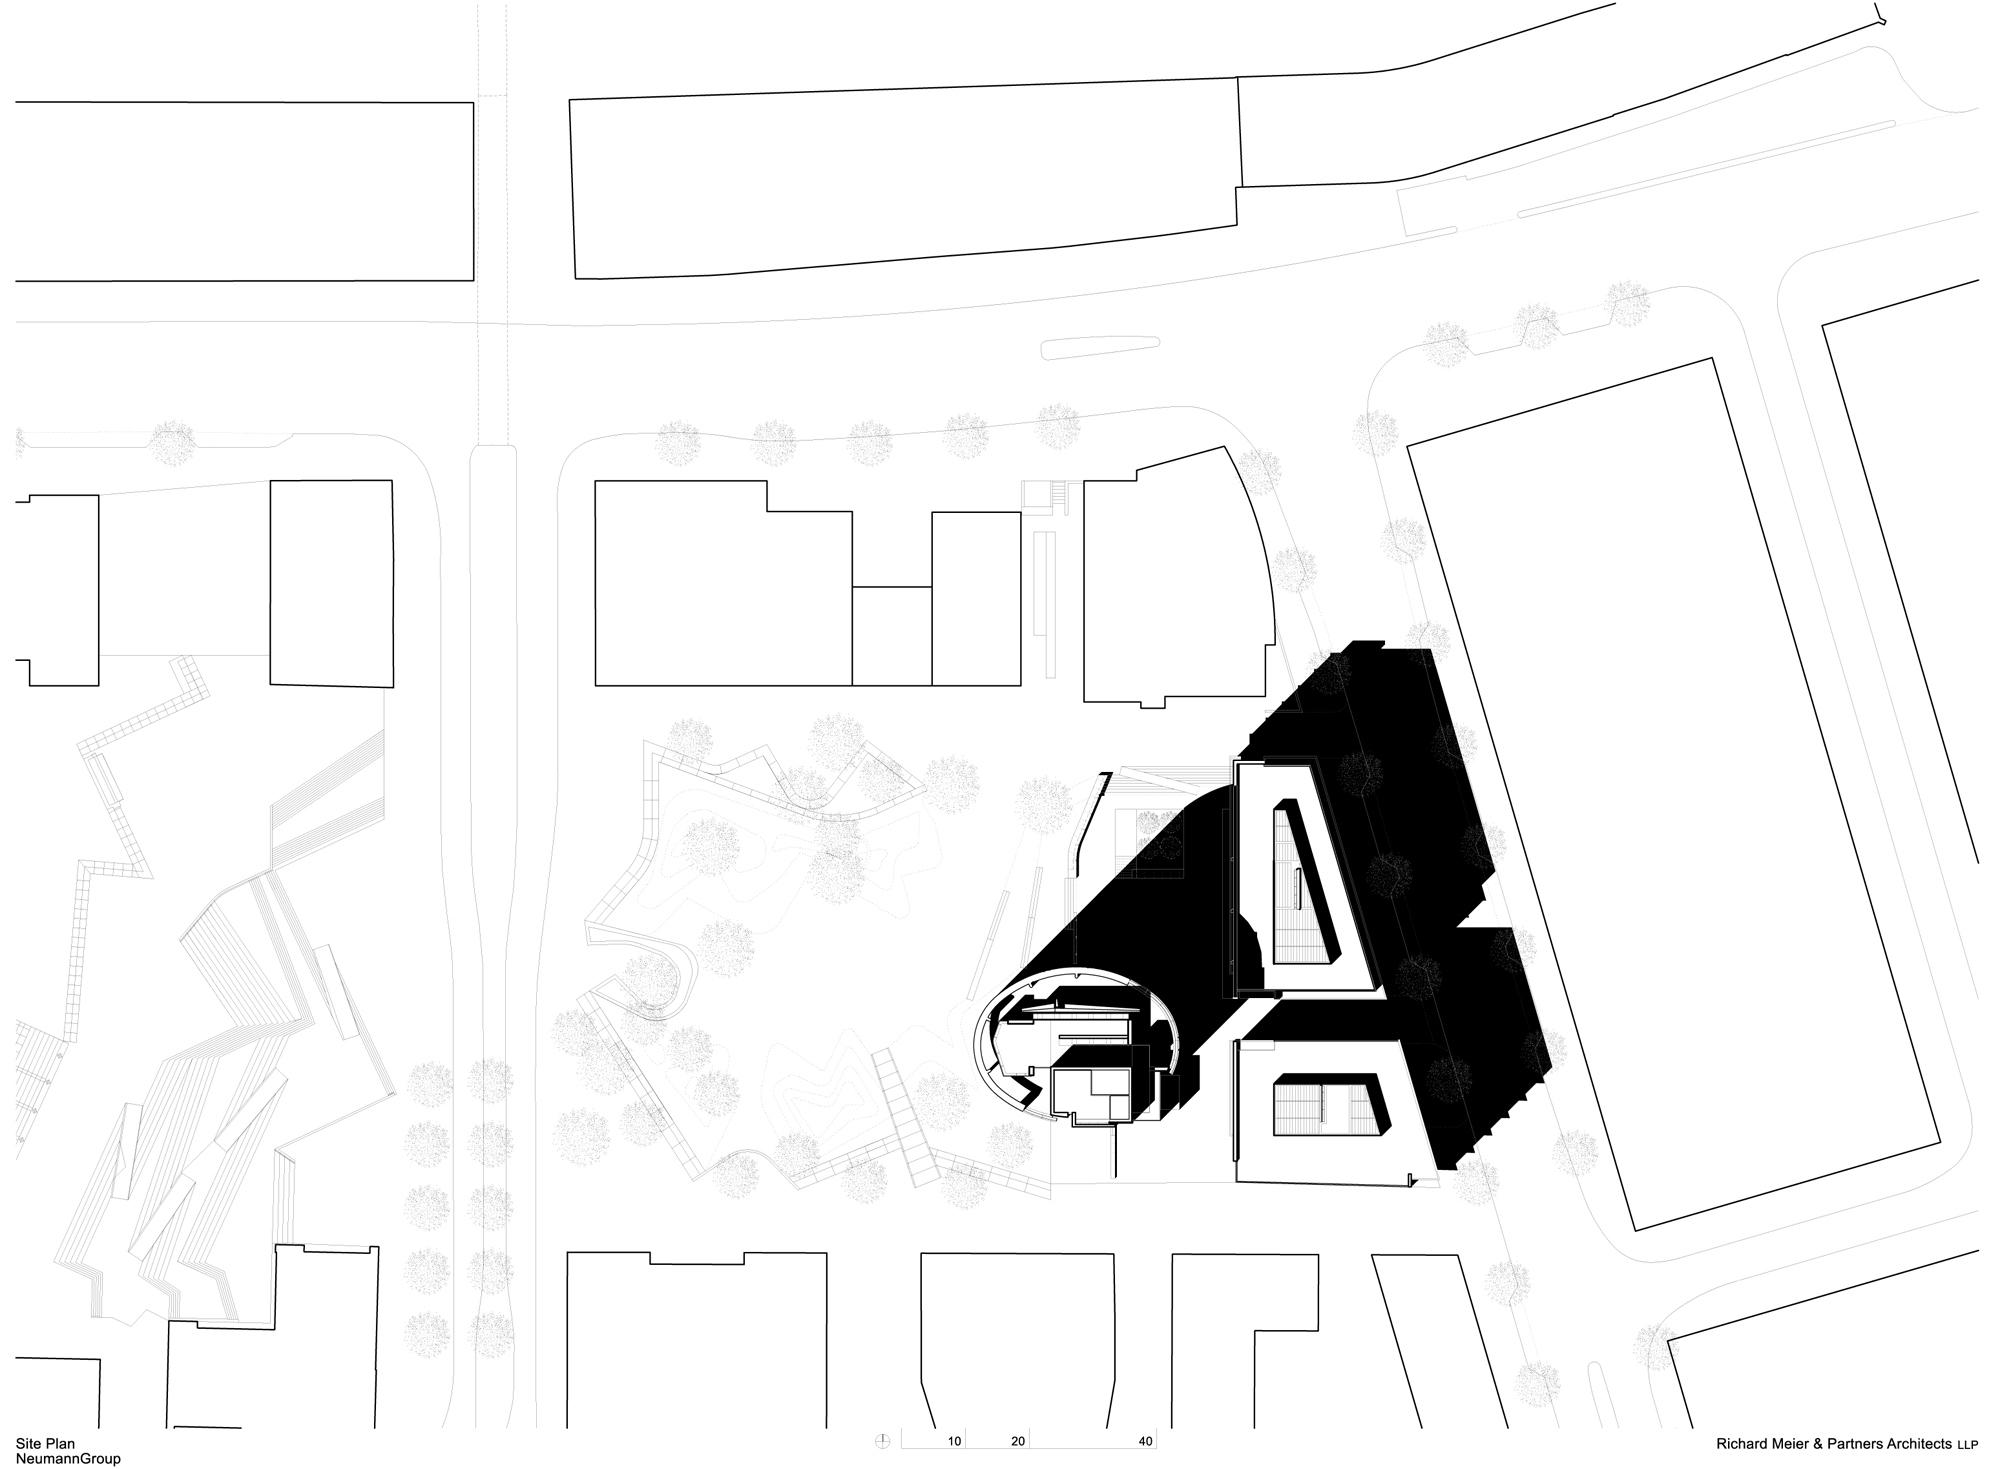 International Coffee Plaza / Richard Meier & Partners